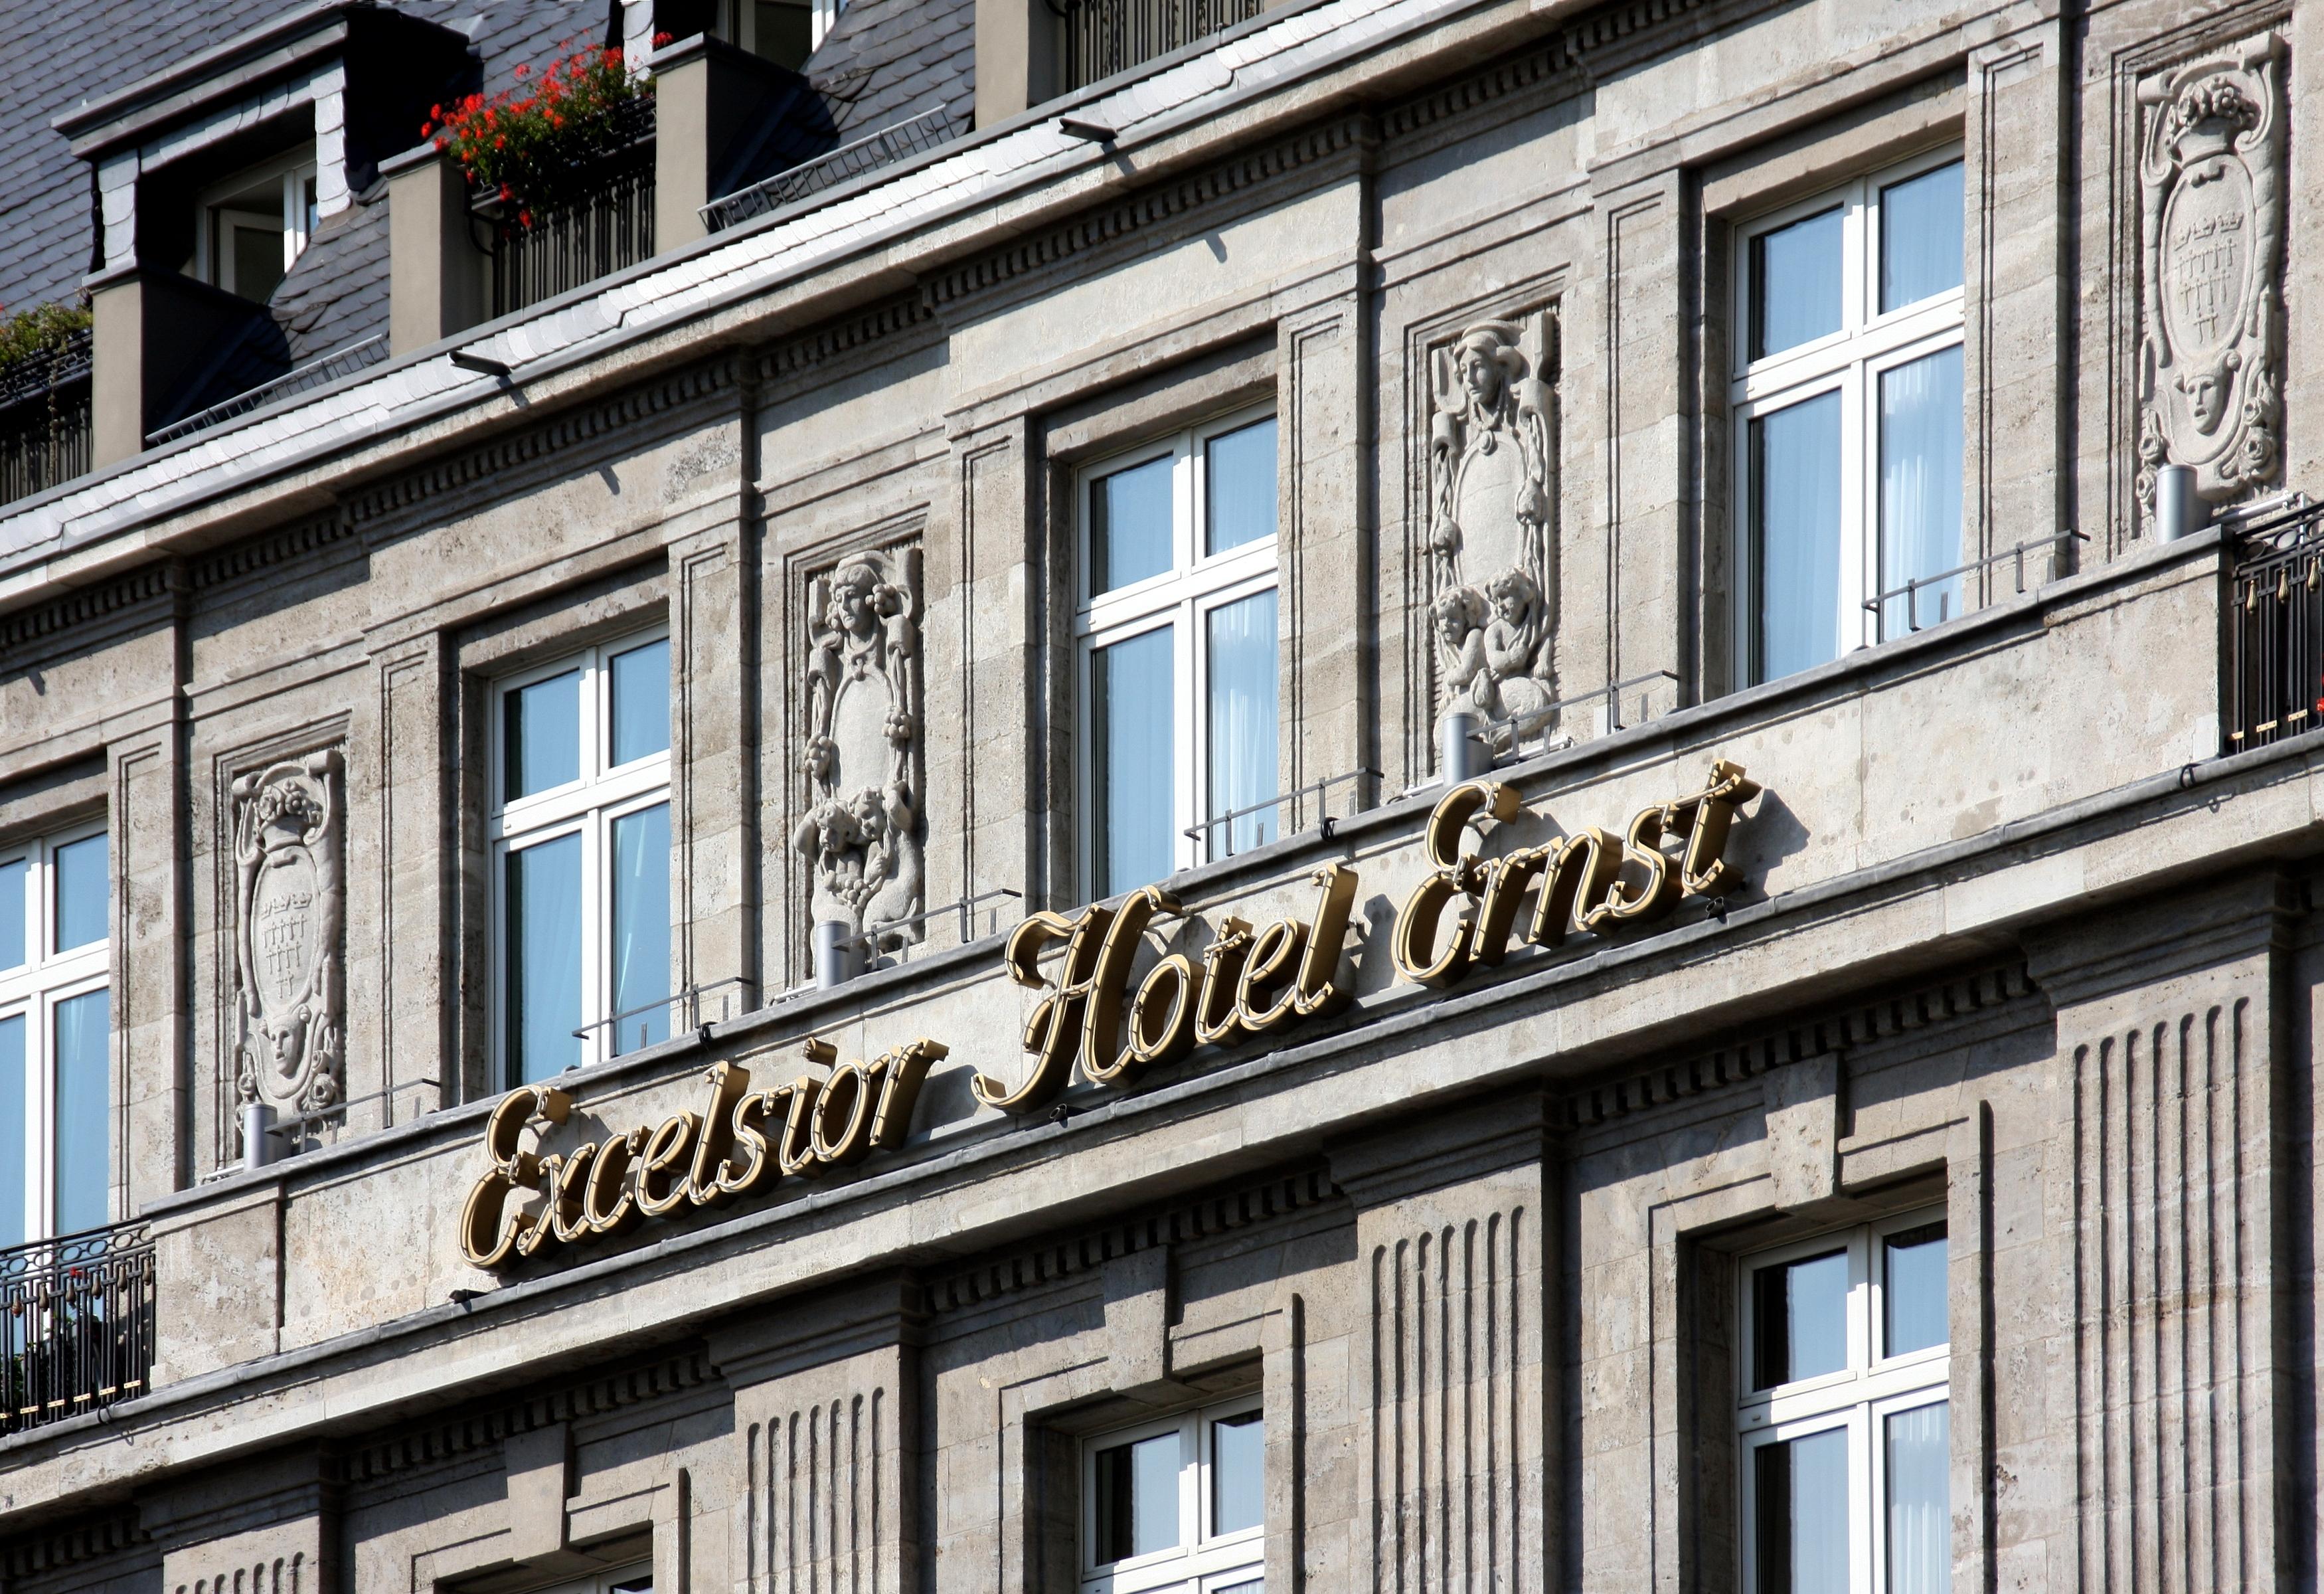 Excelsior Hotel Koln High Tea